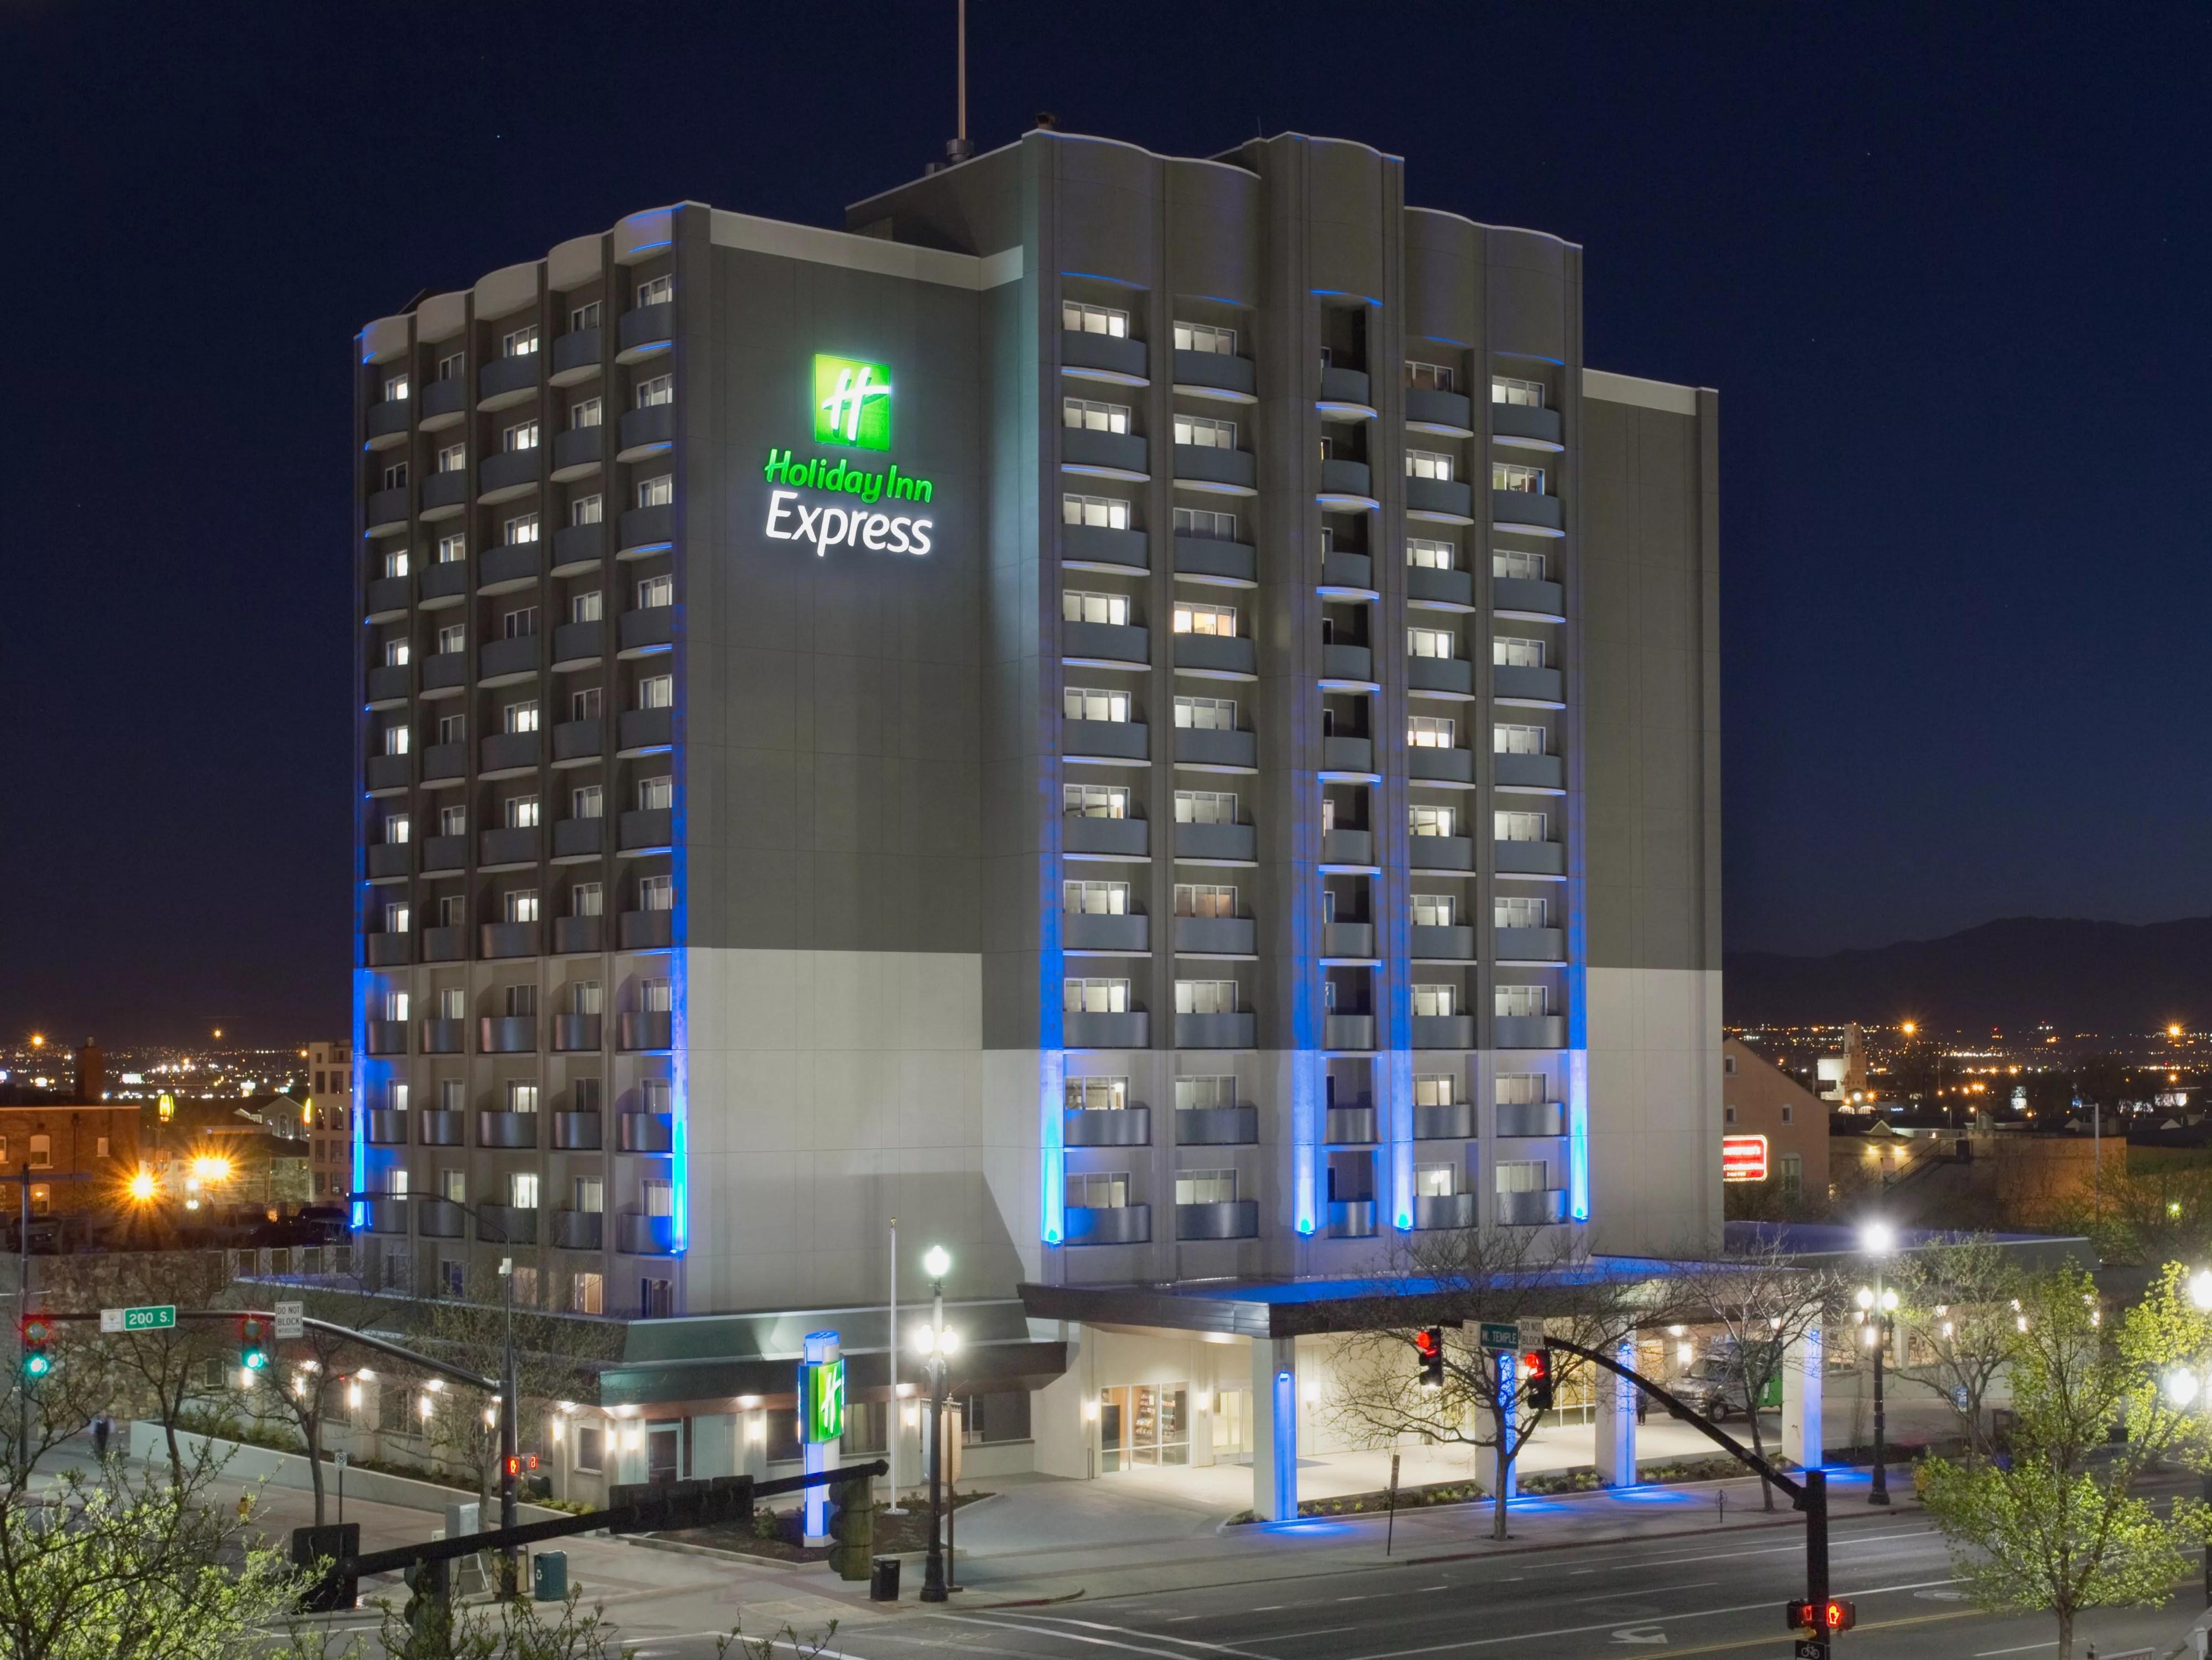 Leisure Living In Slc 644 City Station Apartments Near Downtown Salt Lake City Ut Residence